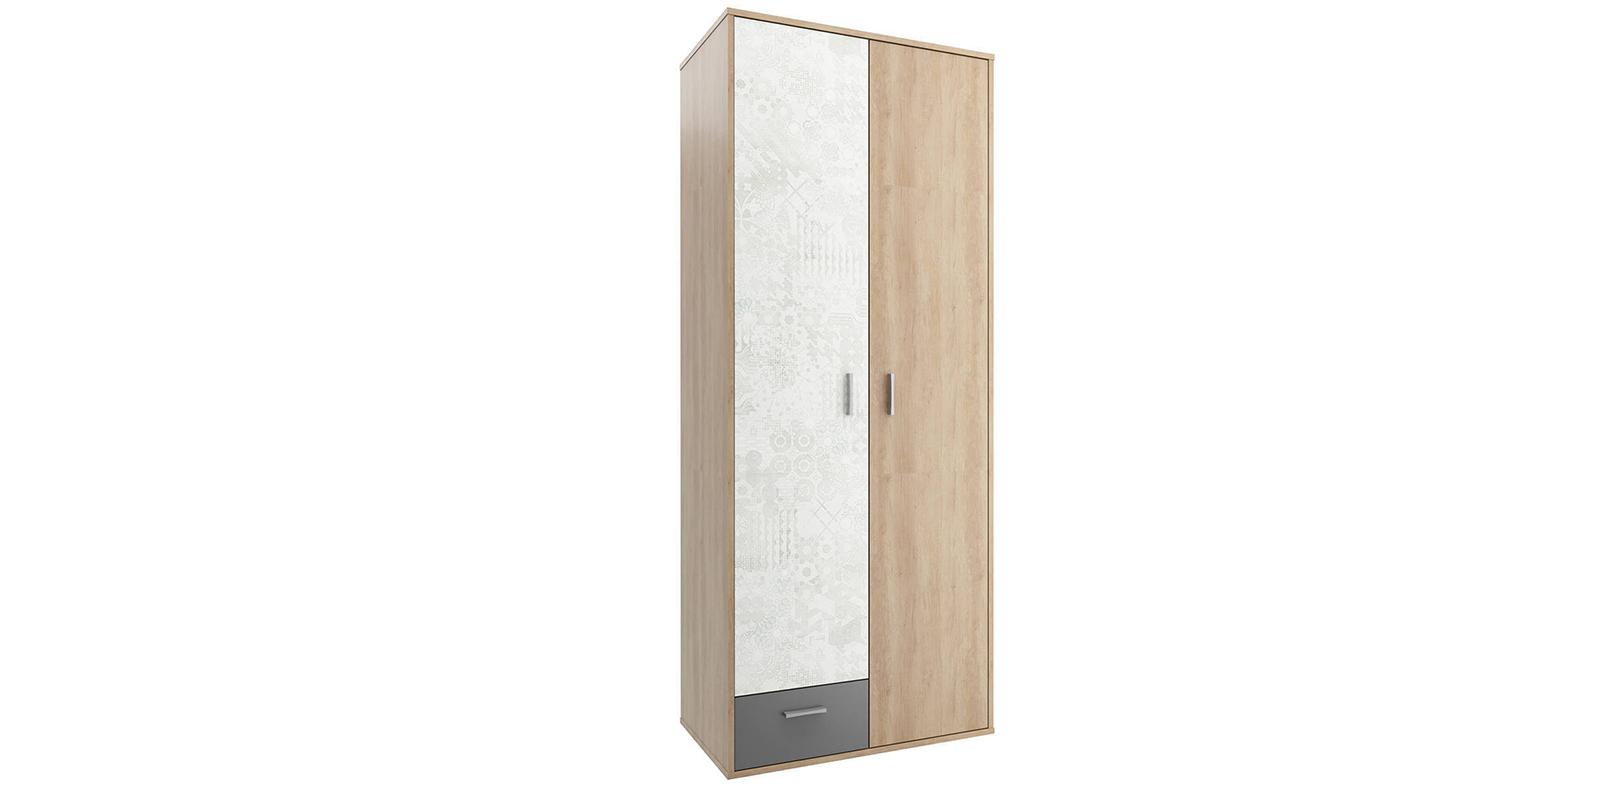 Шкаф распашной двухдверный Алекс (дуб небраска/антрацит)